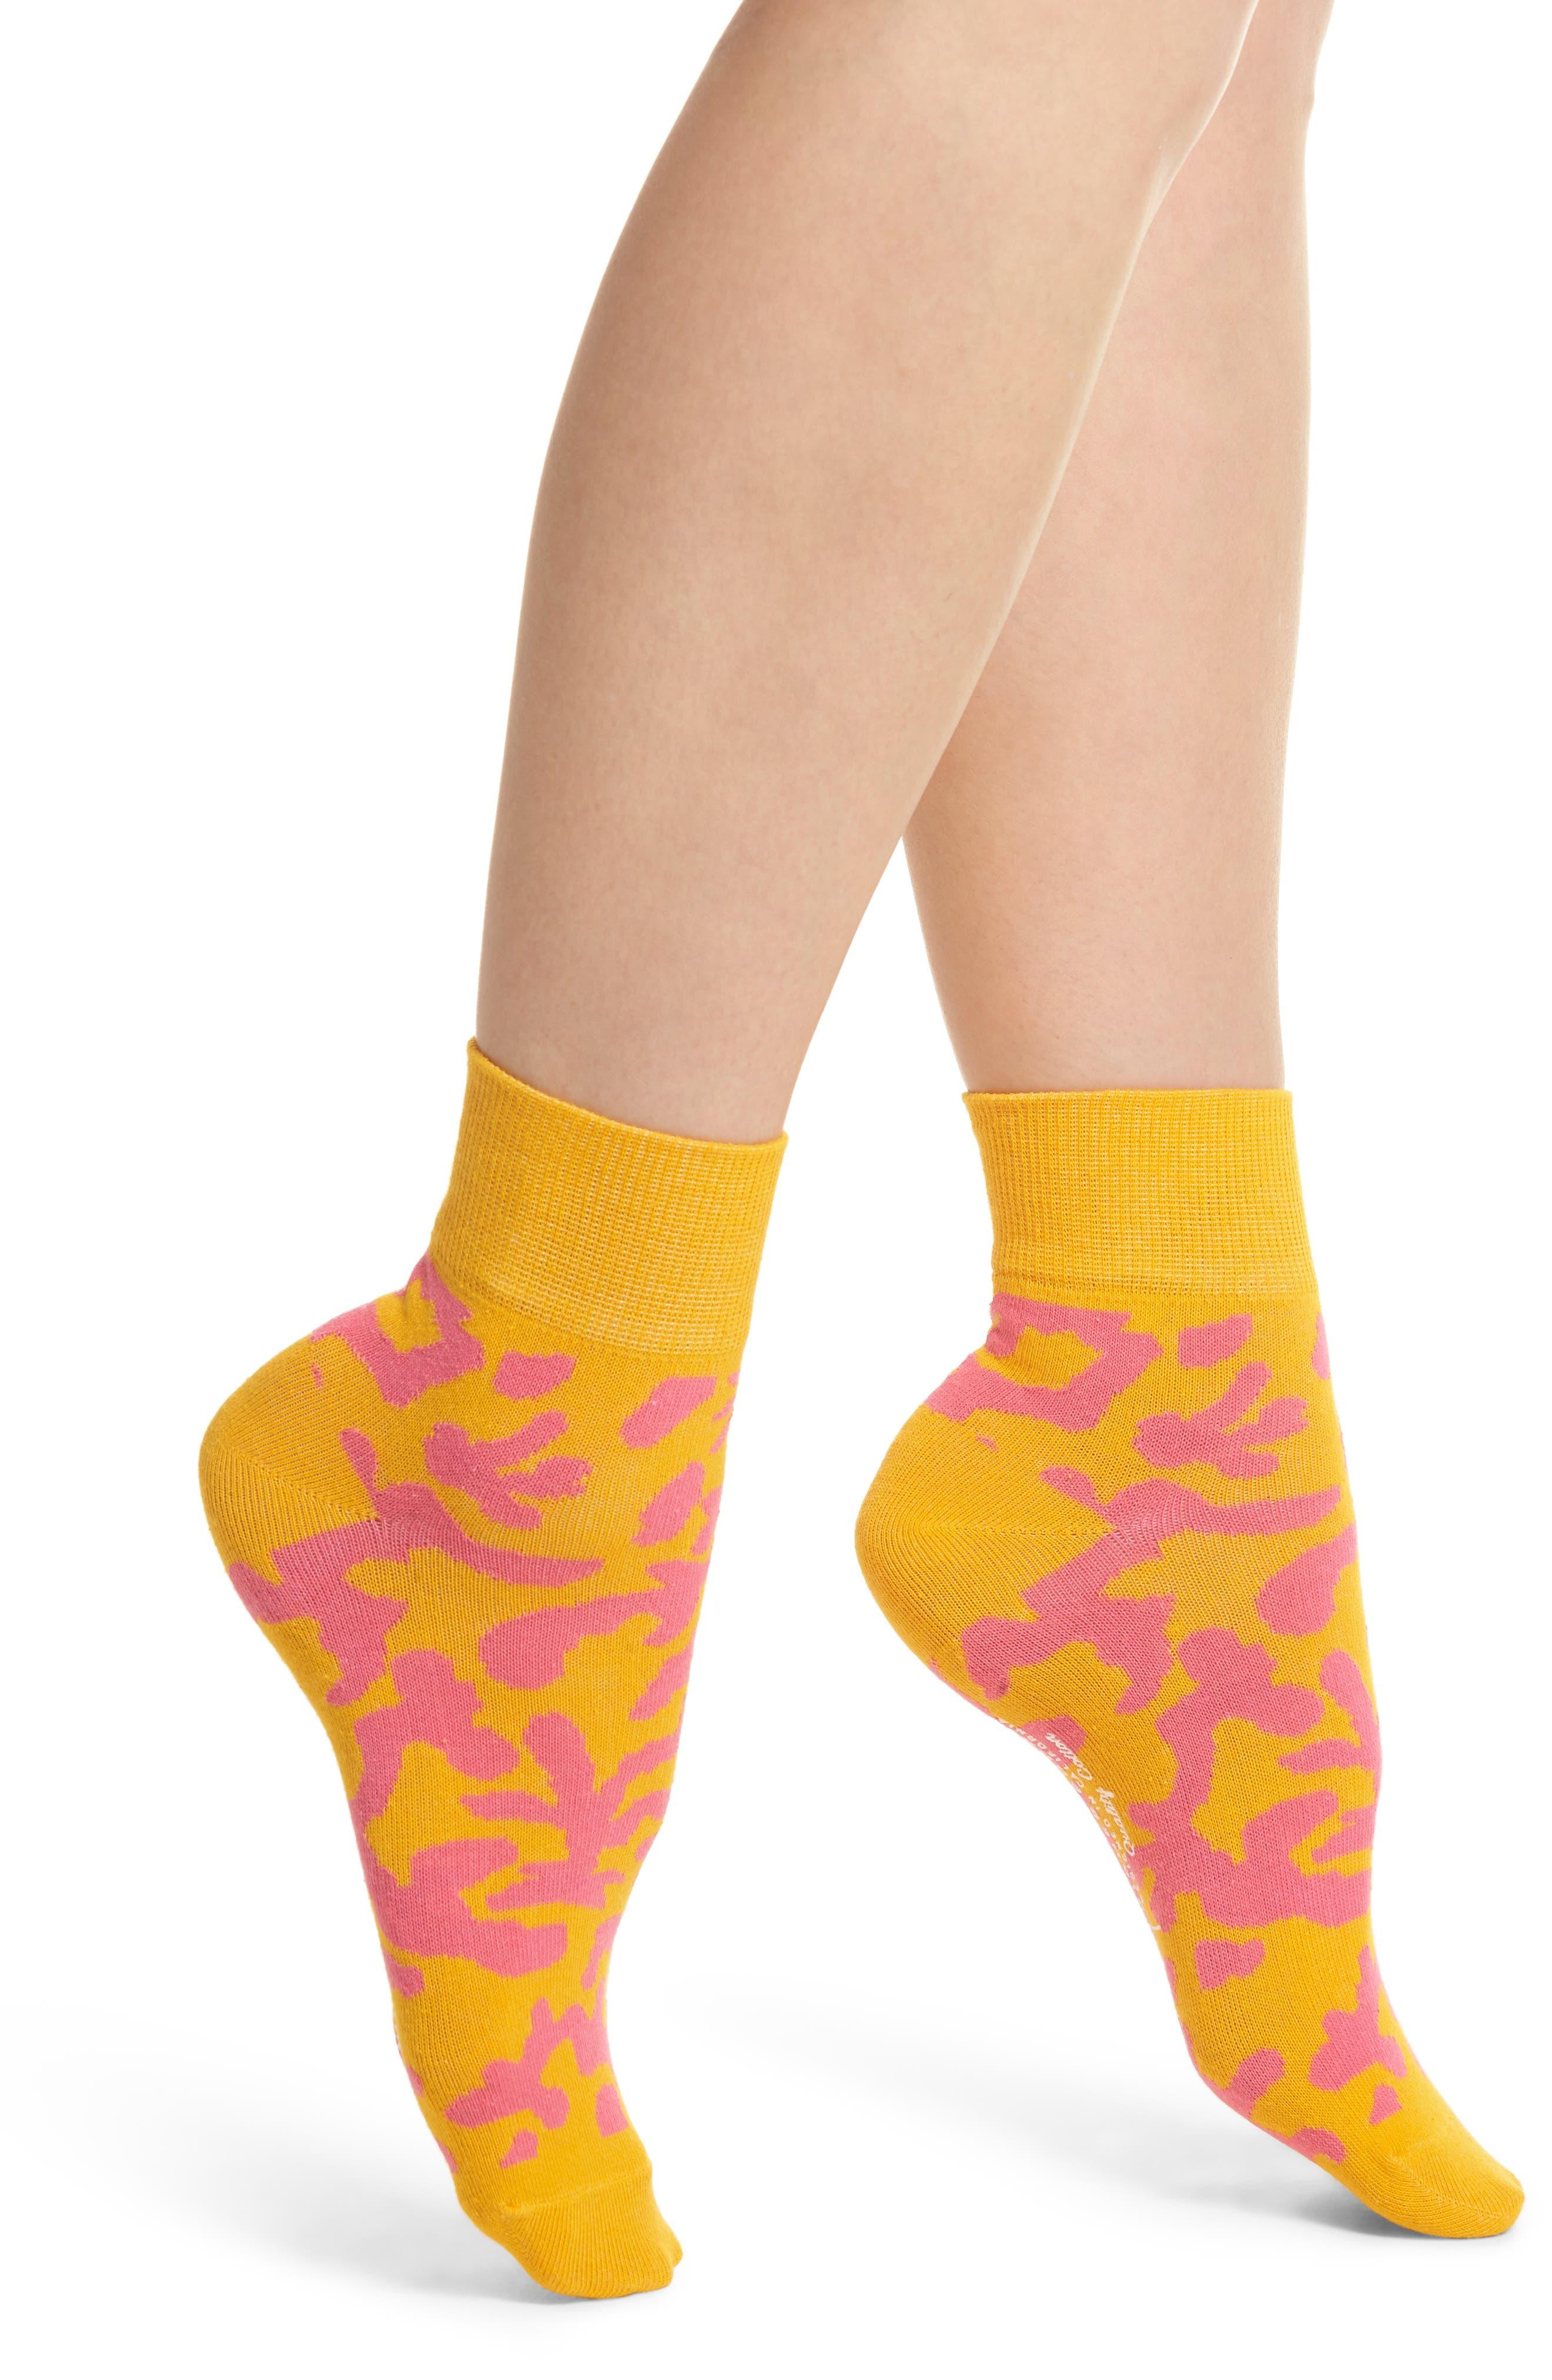 Coral Will Bryant Crew Socks,                         Main,                         color, 820